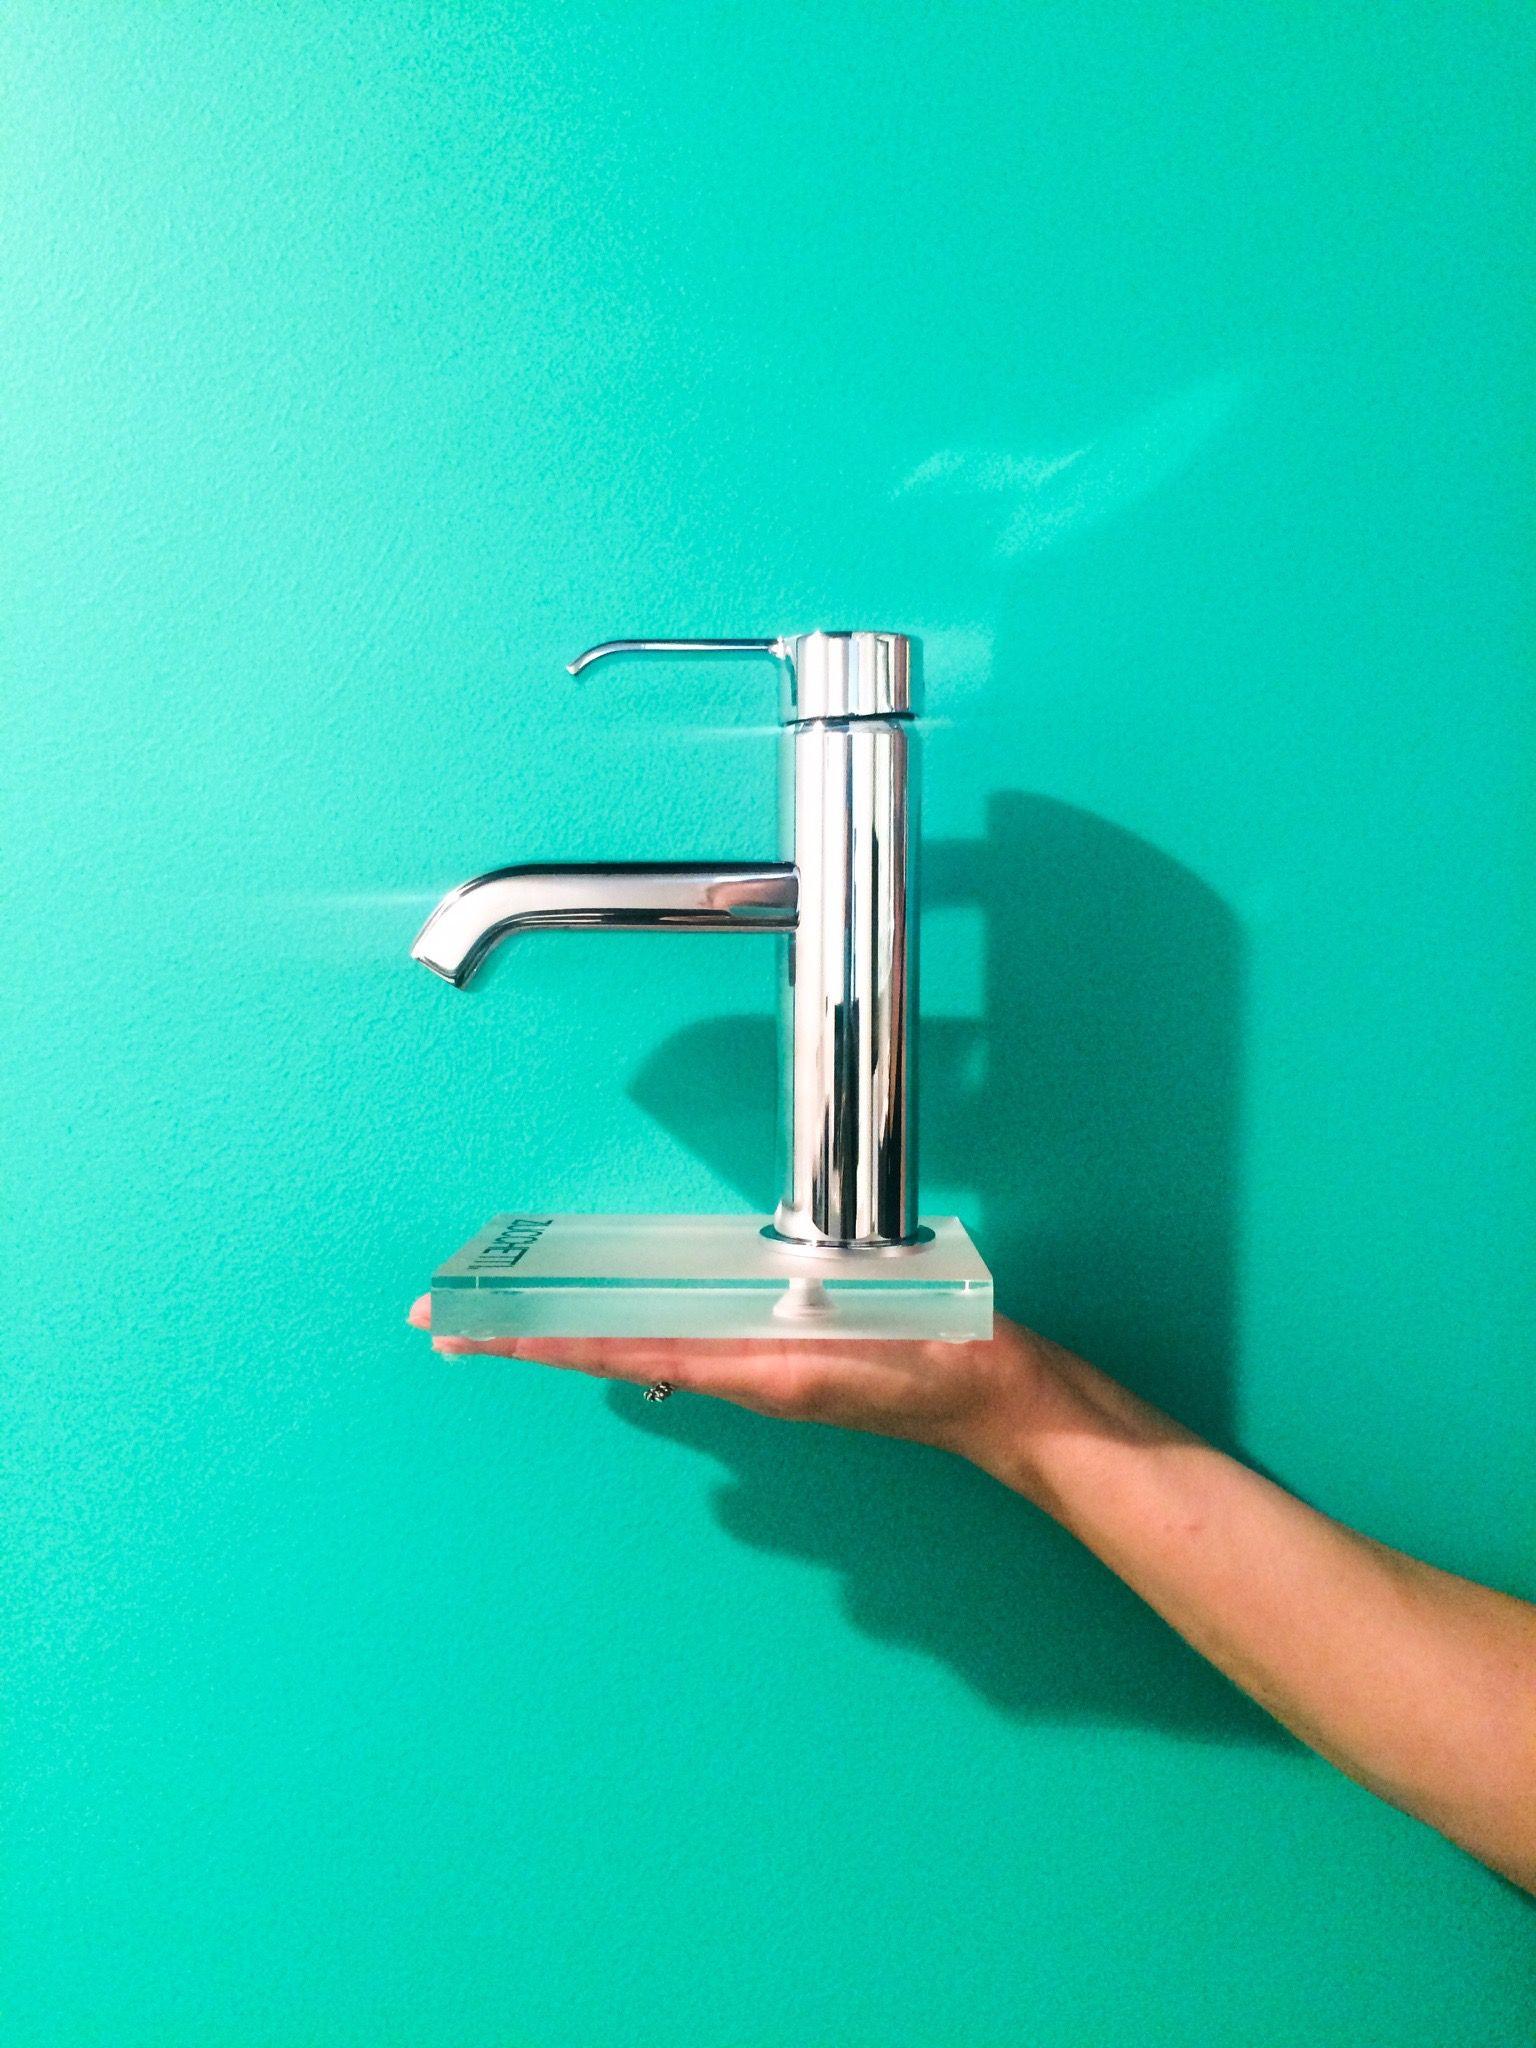 ON! Tapware range from Zucchetti Bathroom fixtures